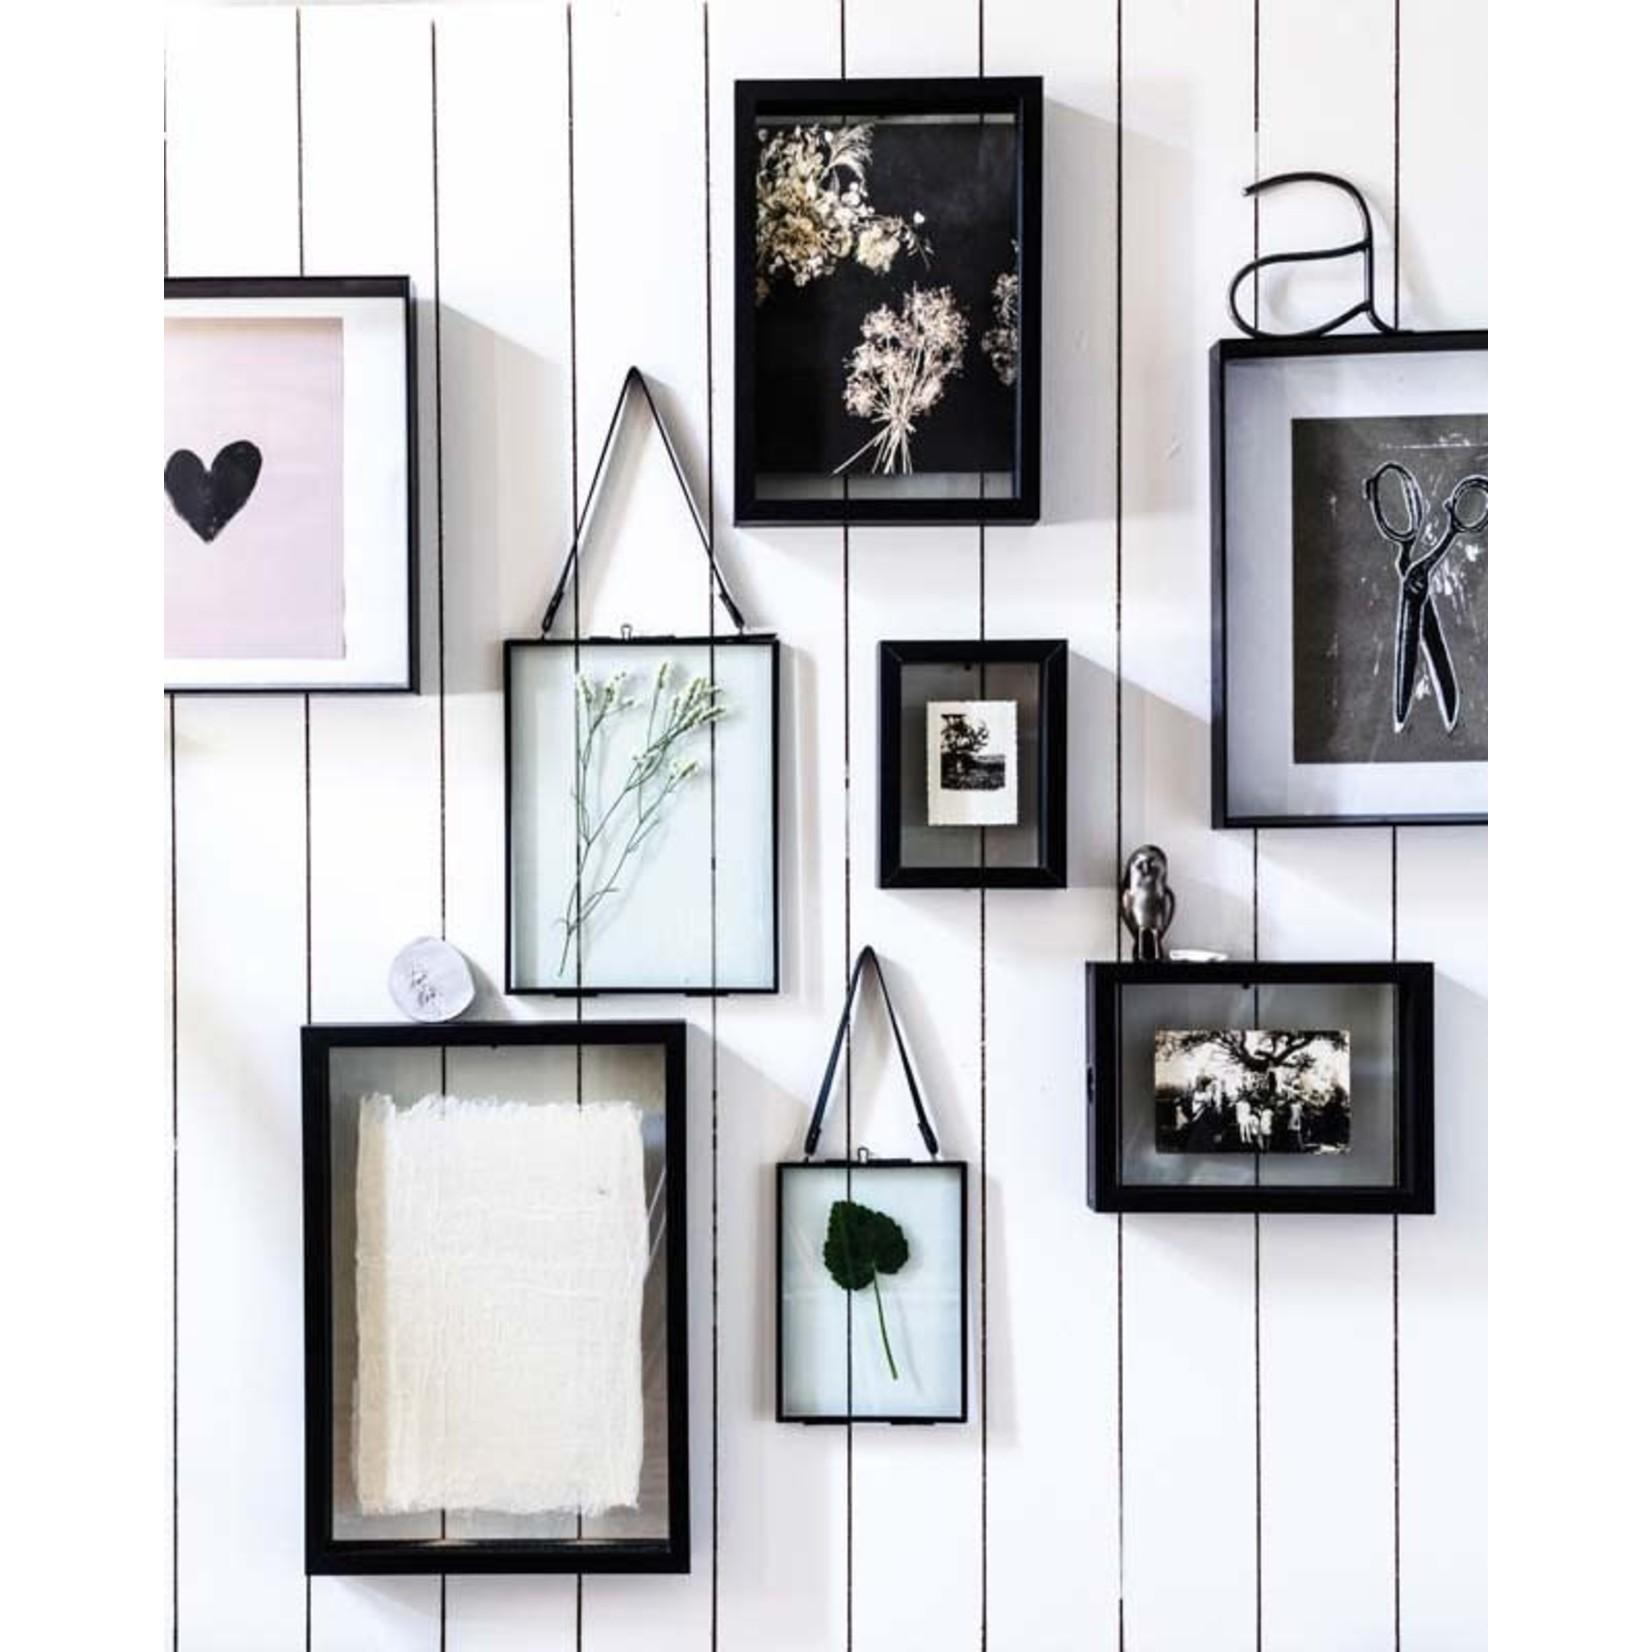 vtwonen Basic collection Photo Frame Wood Black A4 28x40x4cm